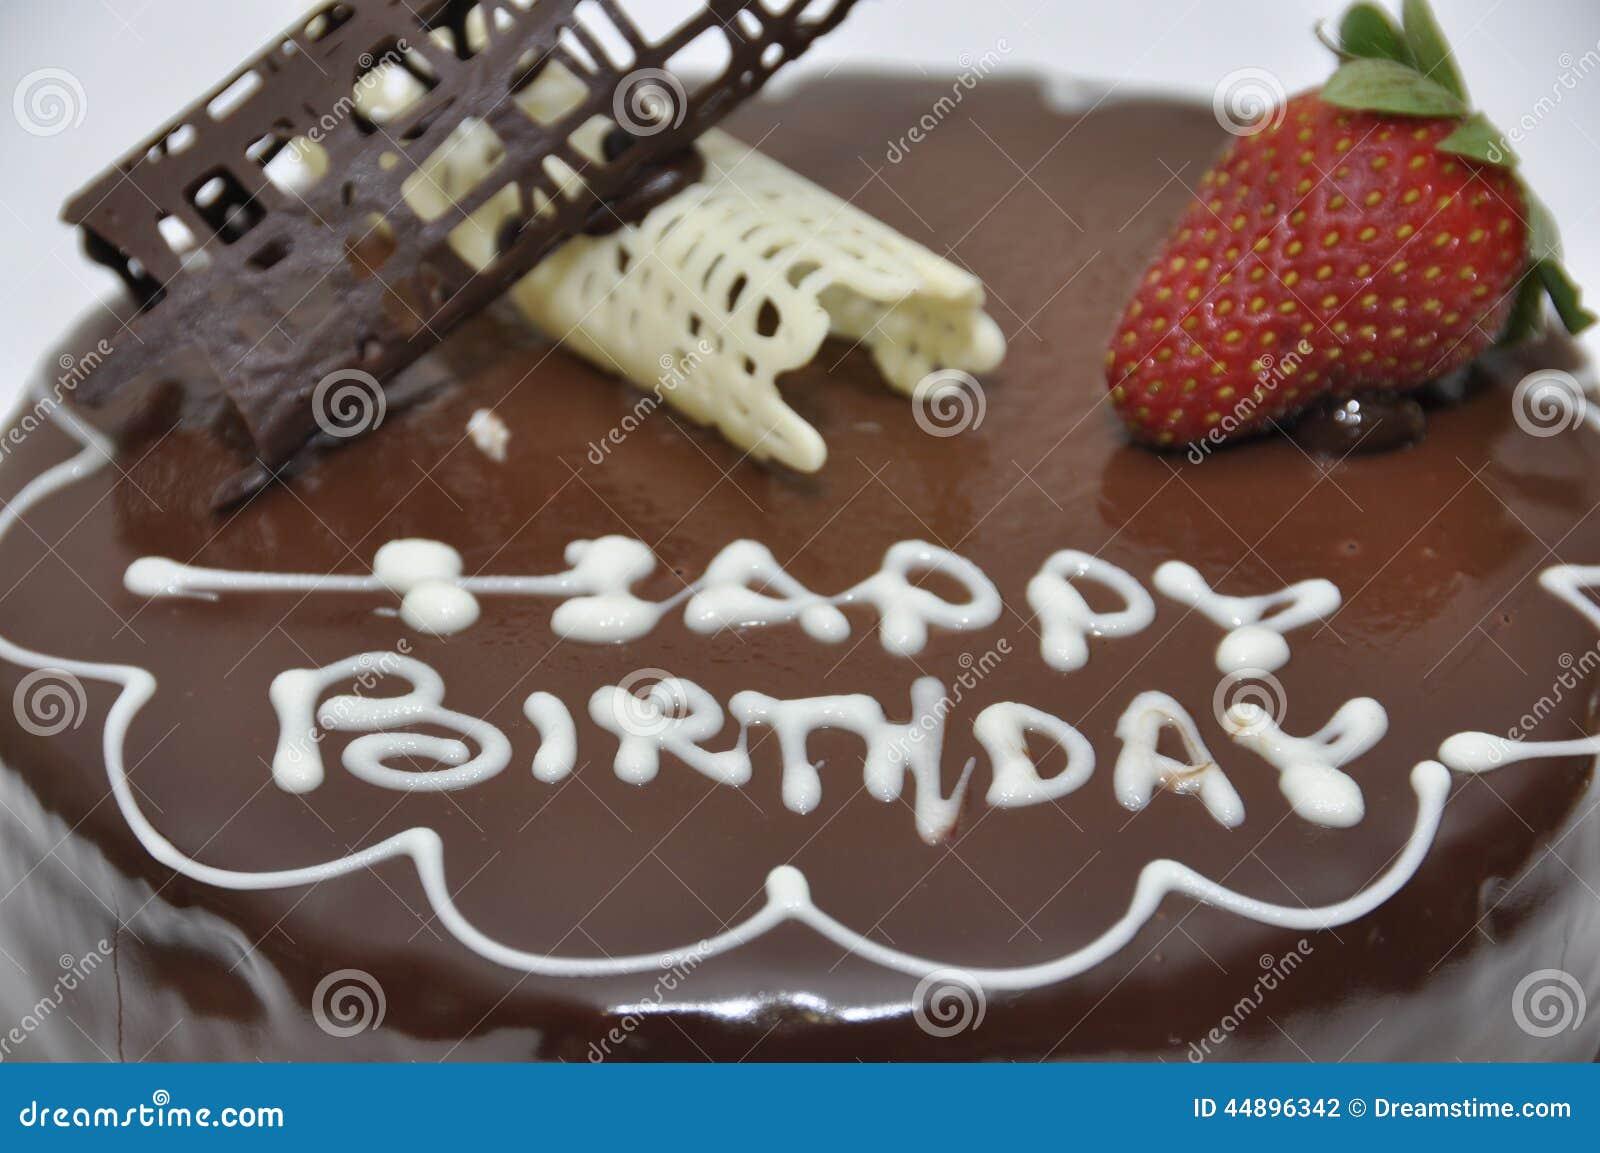 Happy Birthday Chocolate Cake Stock Photo Image 44896342